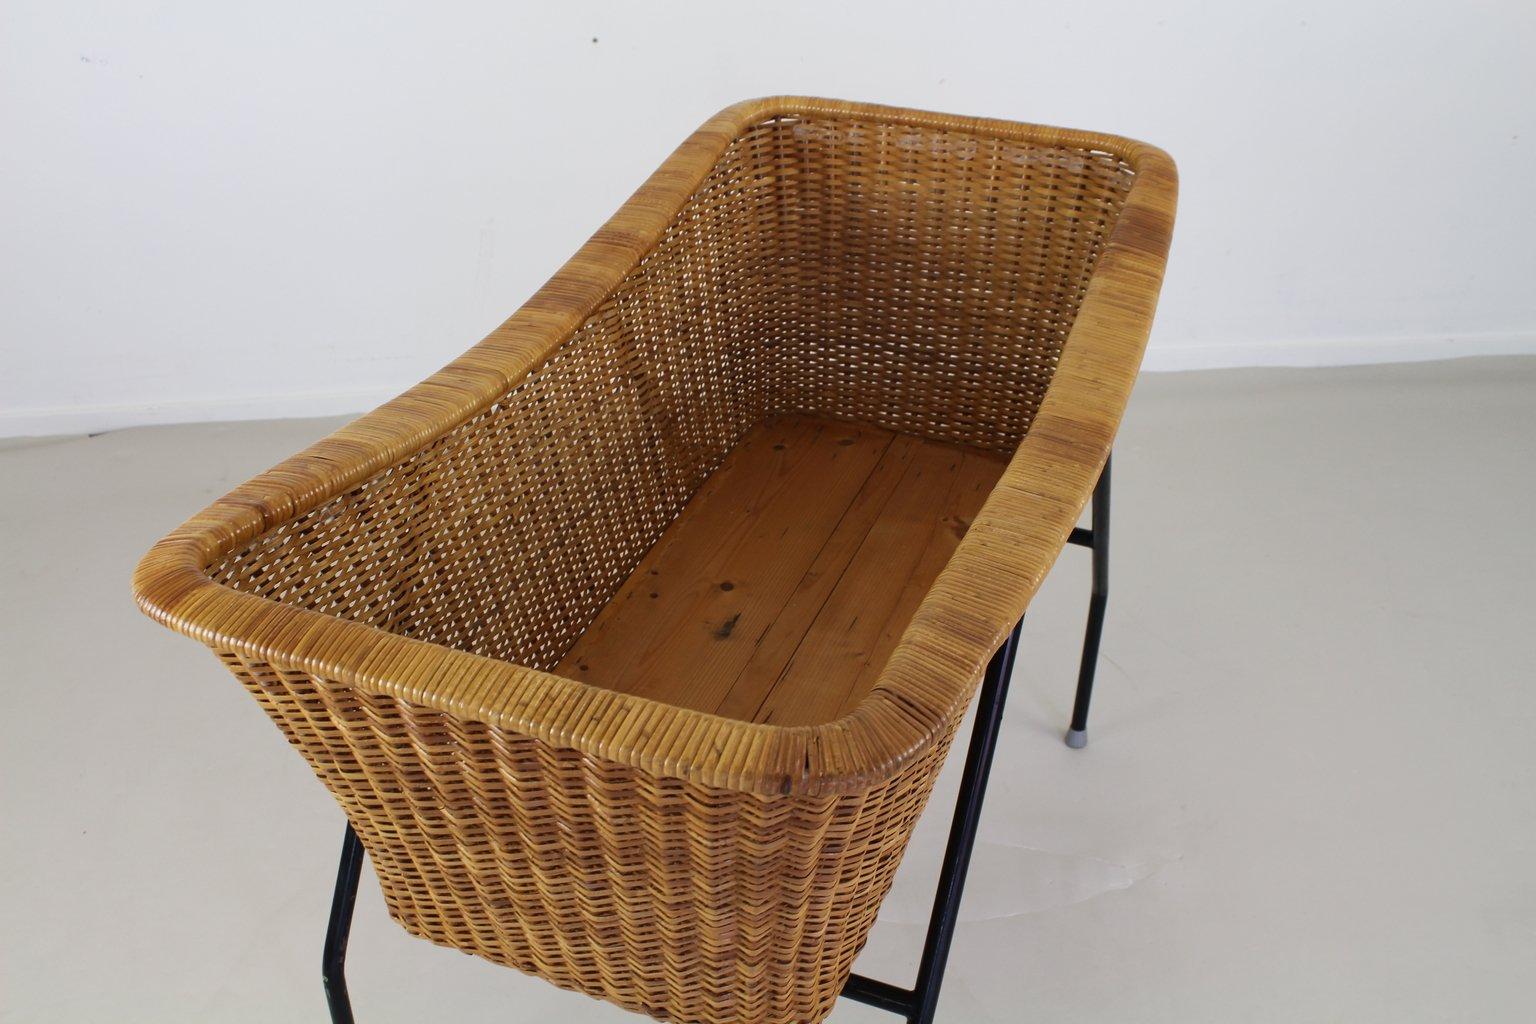 Rattan bassinet